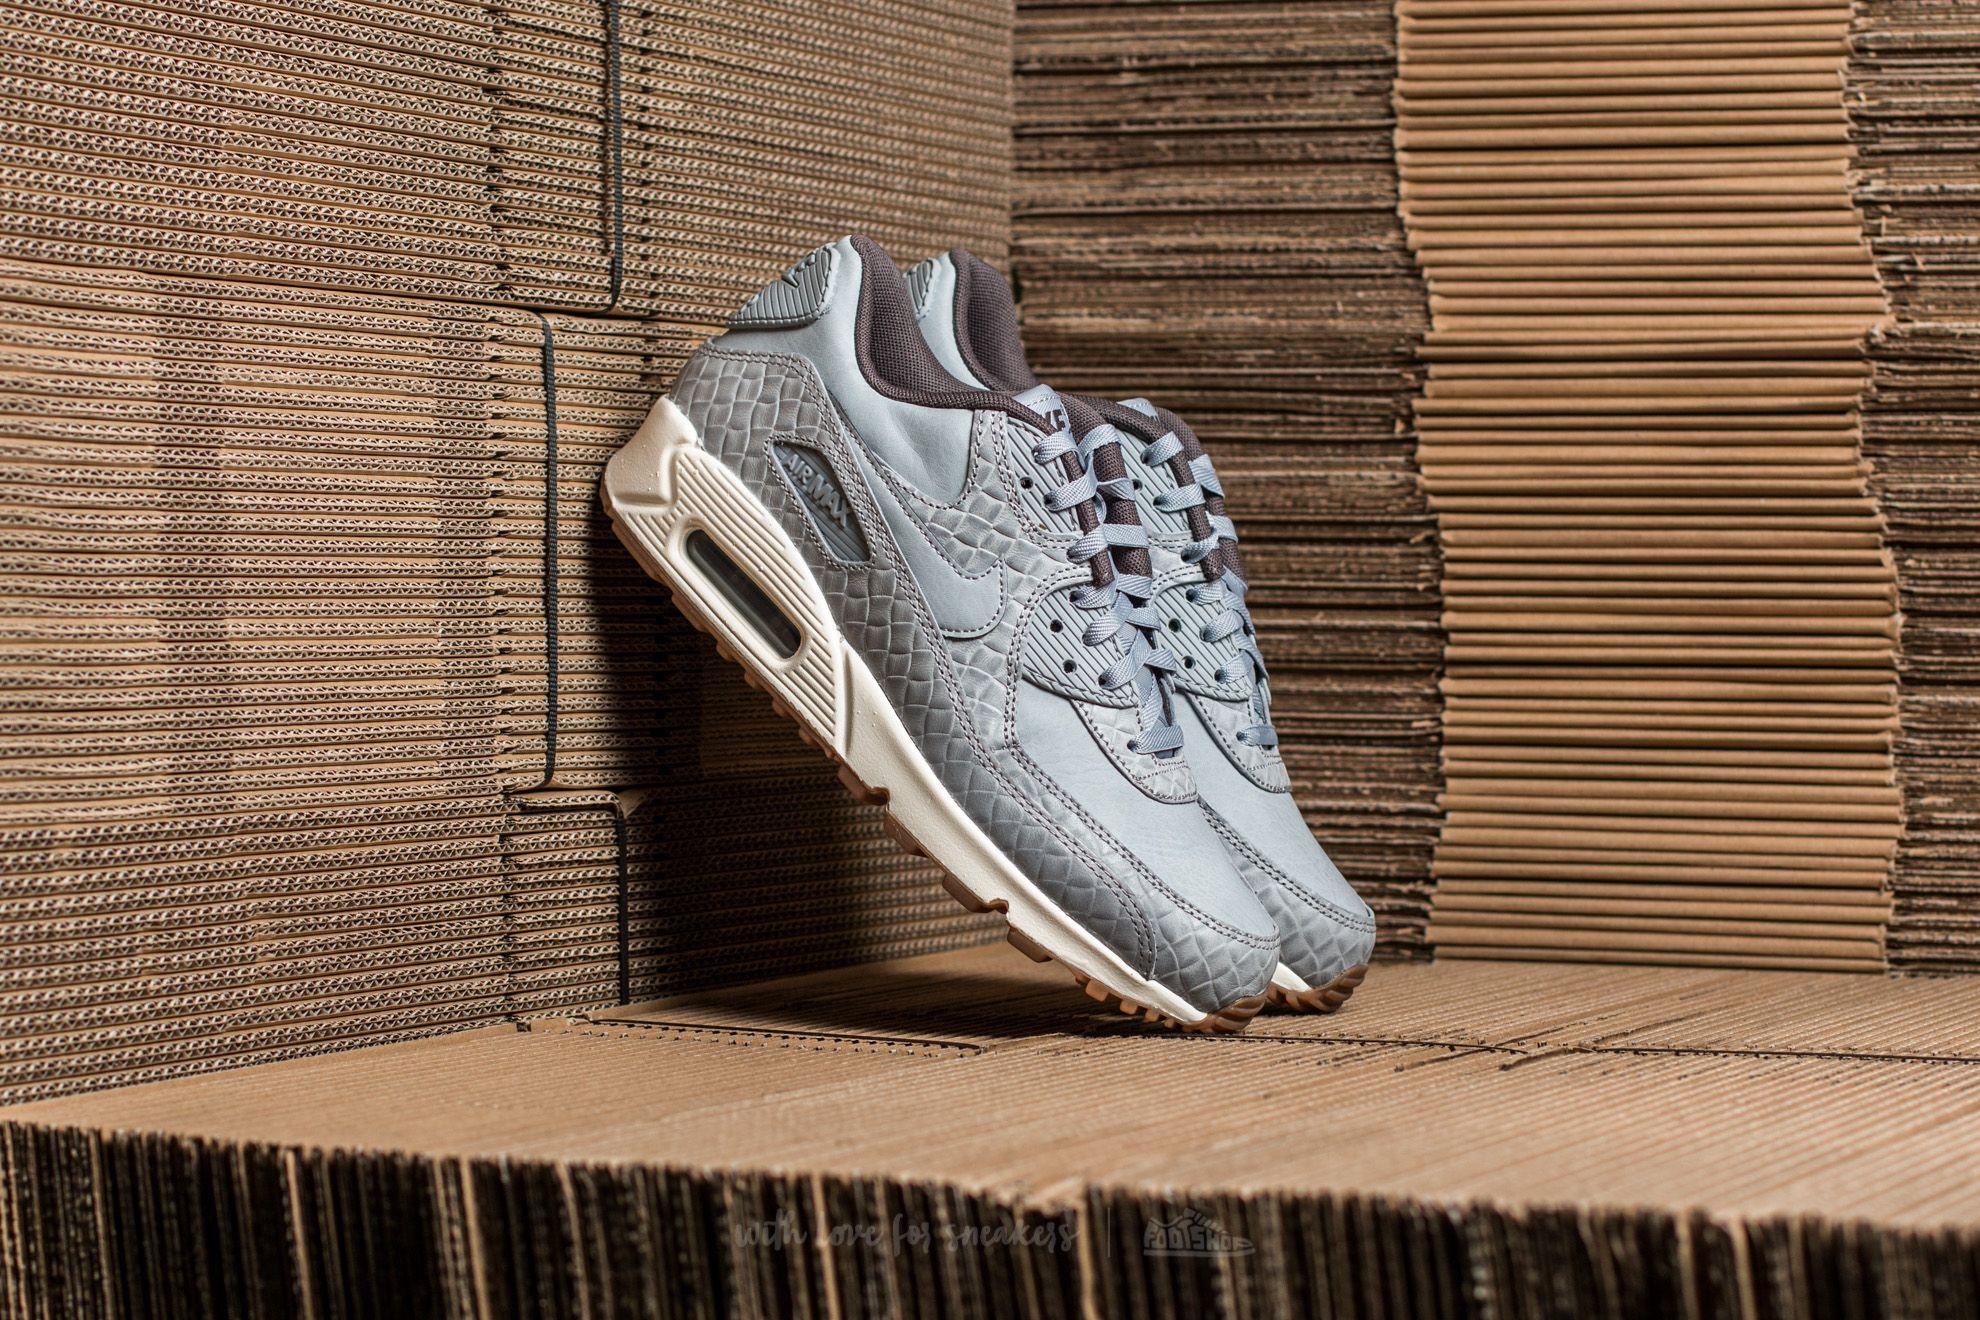 Nike Wmns Air Max 90 Premium Wolf Grey/ Wolf Grey-Sail